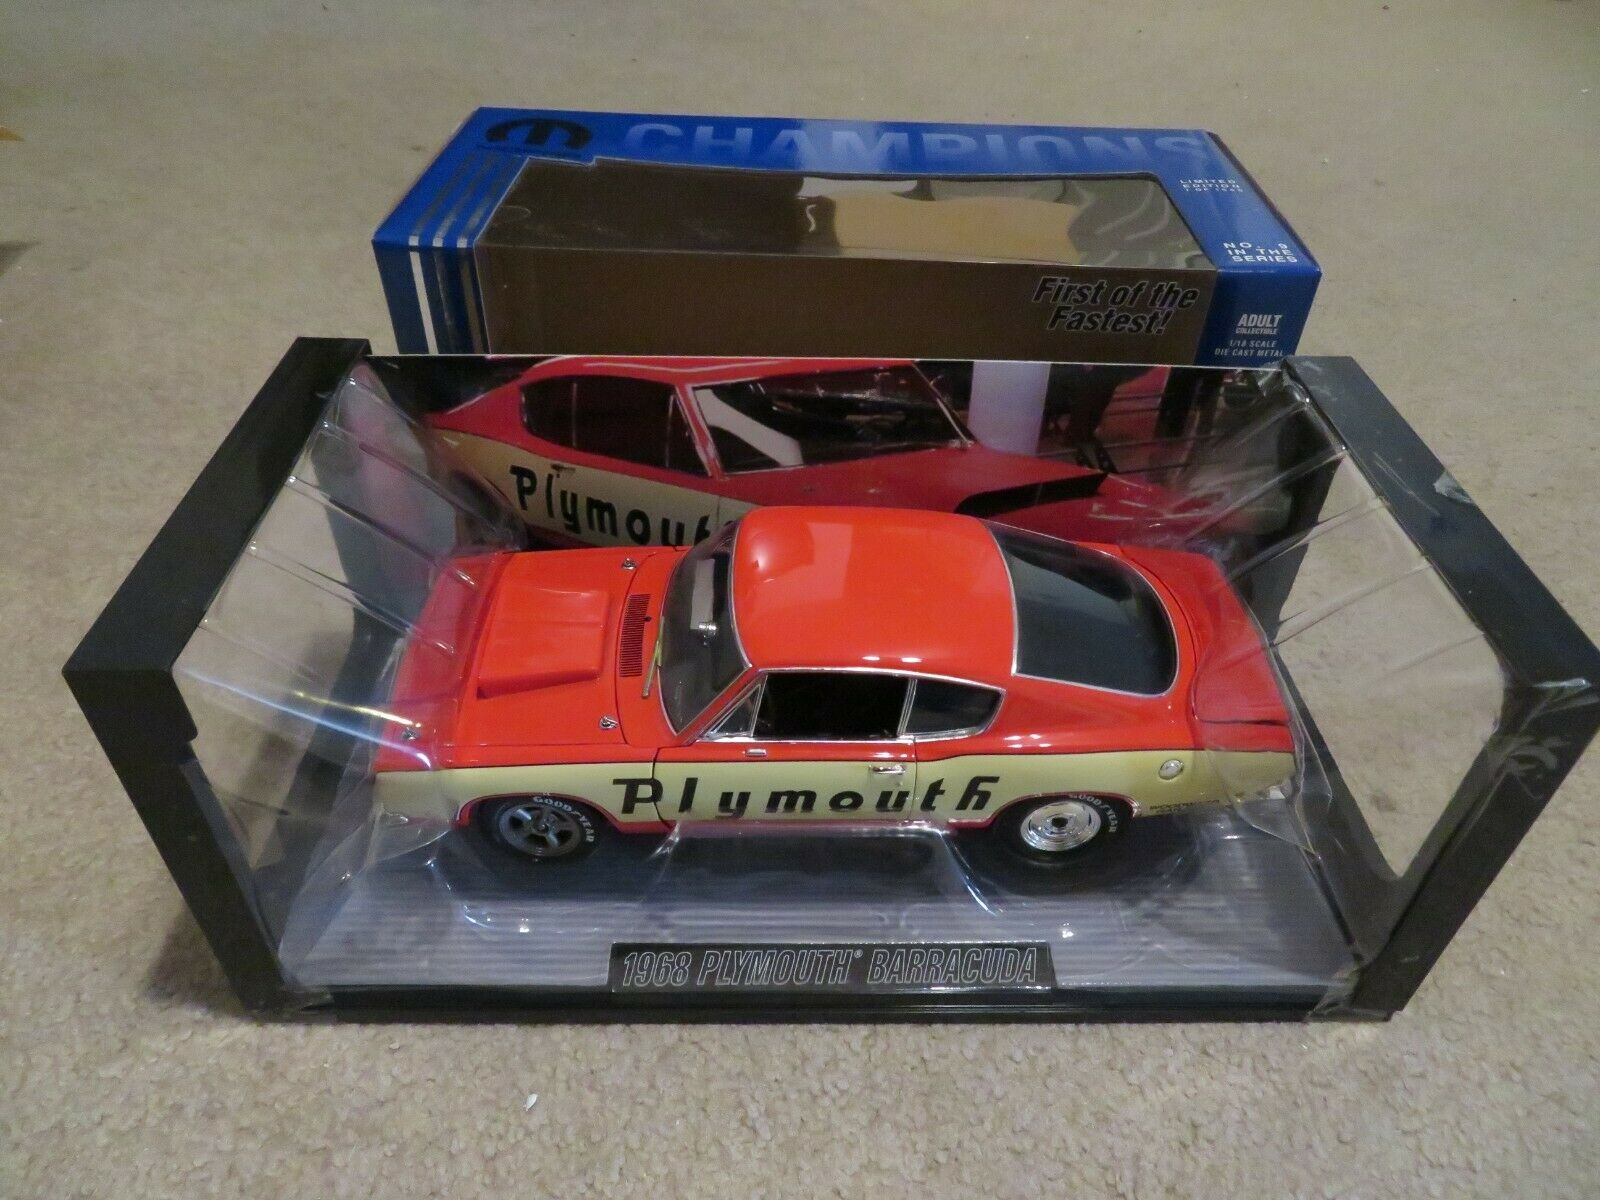 descuento online Die Cast Promotions Campeones Campeones Campeones 1968 Plymouth Barracuda Hemi mula coche 1 18 2005  moda